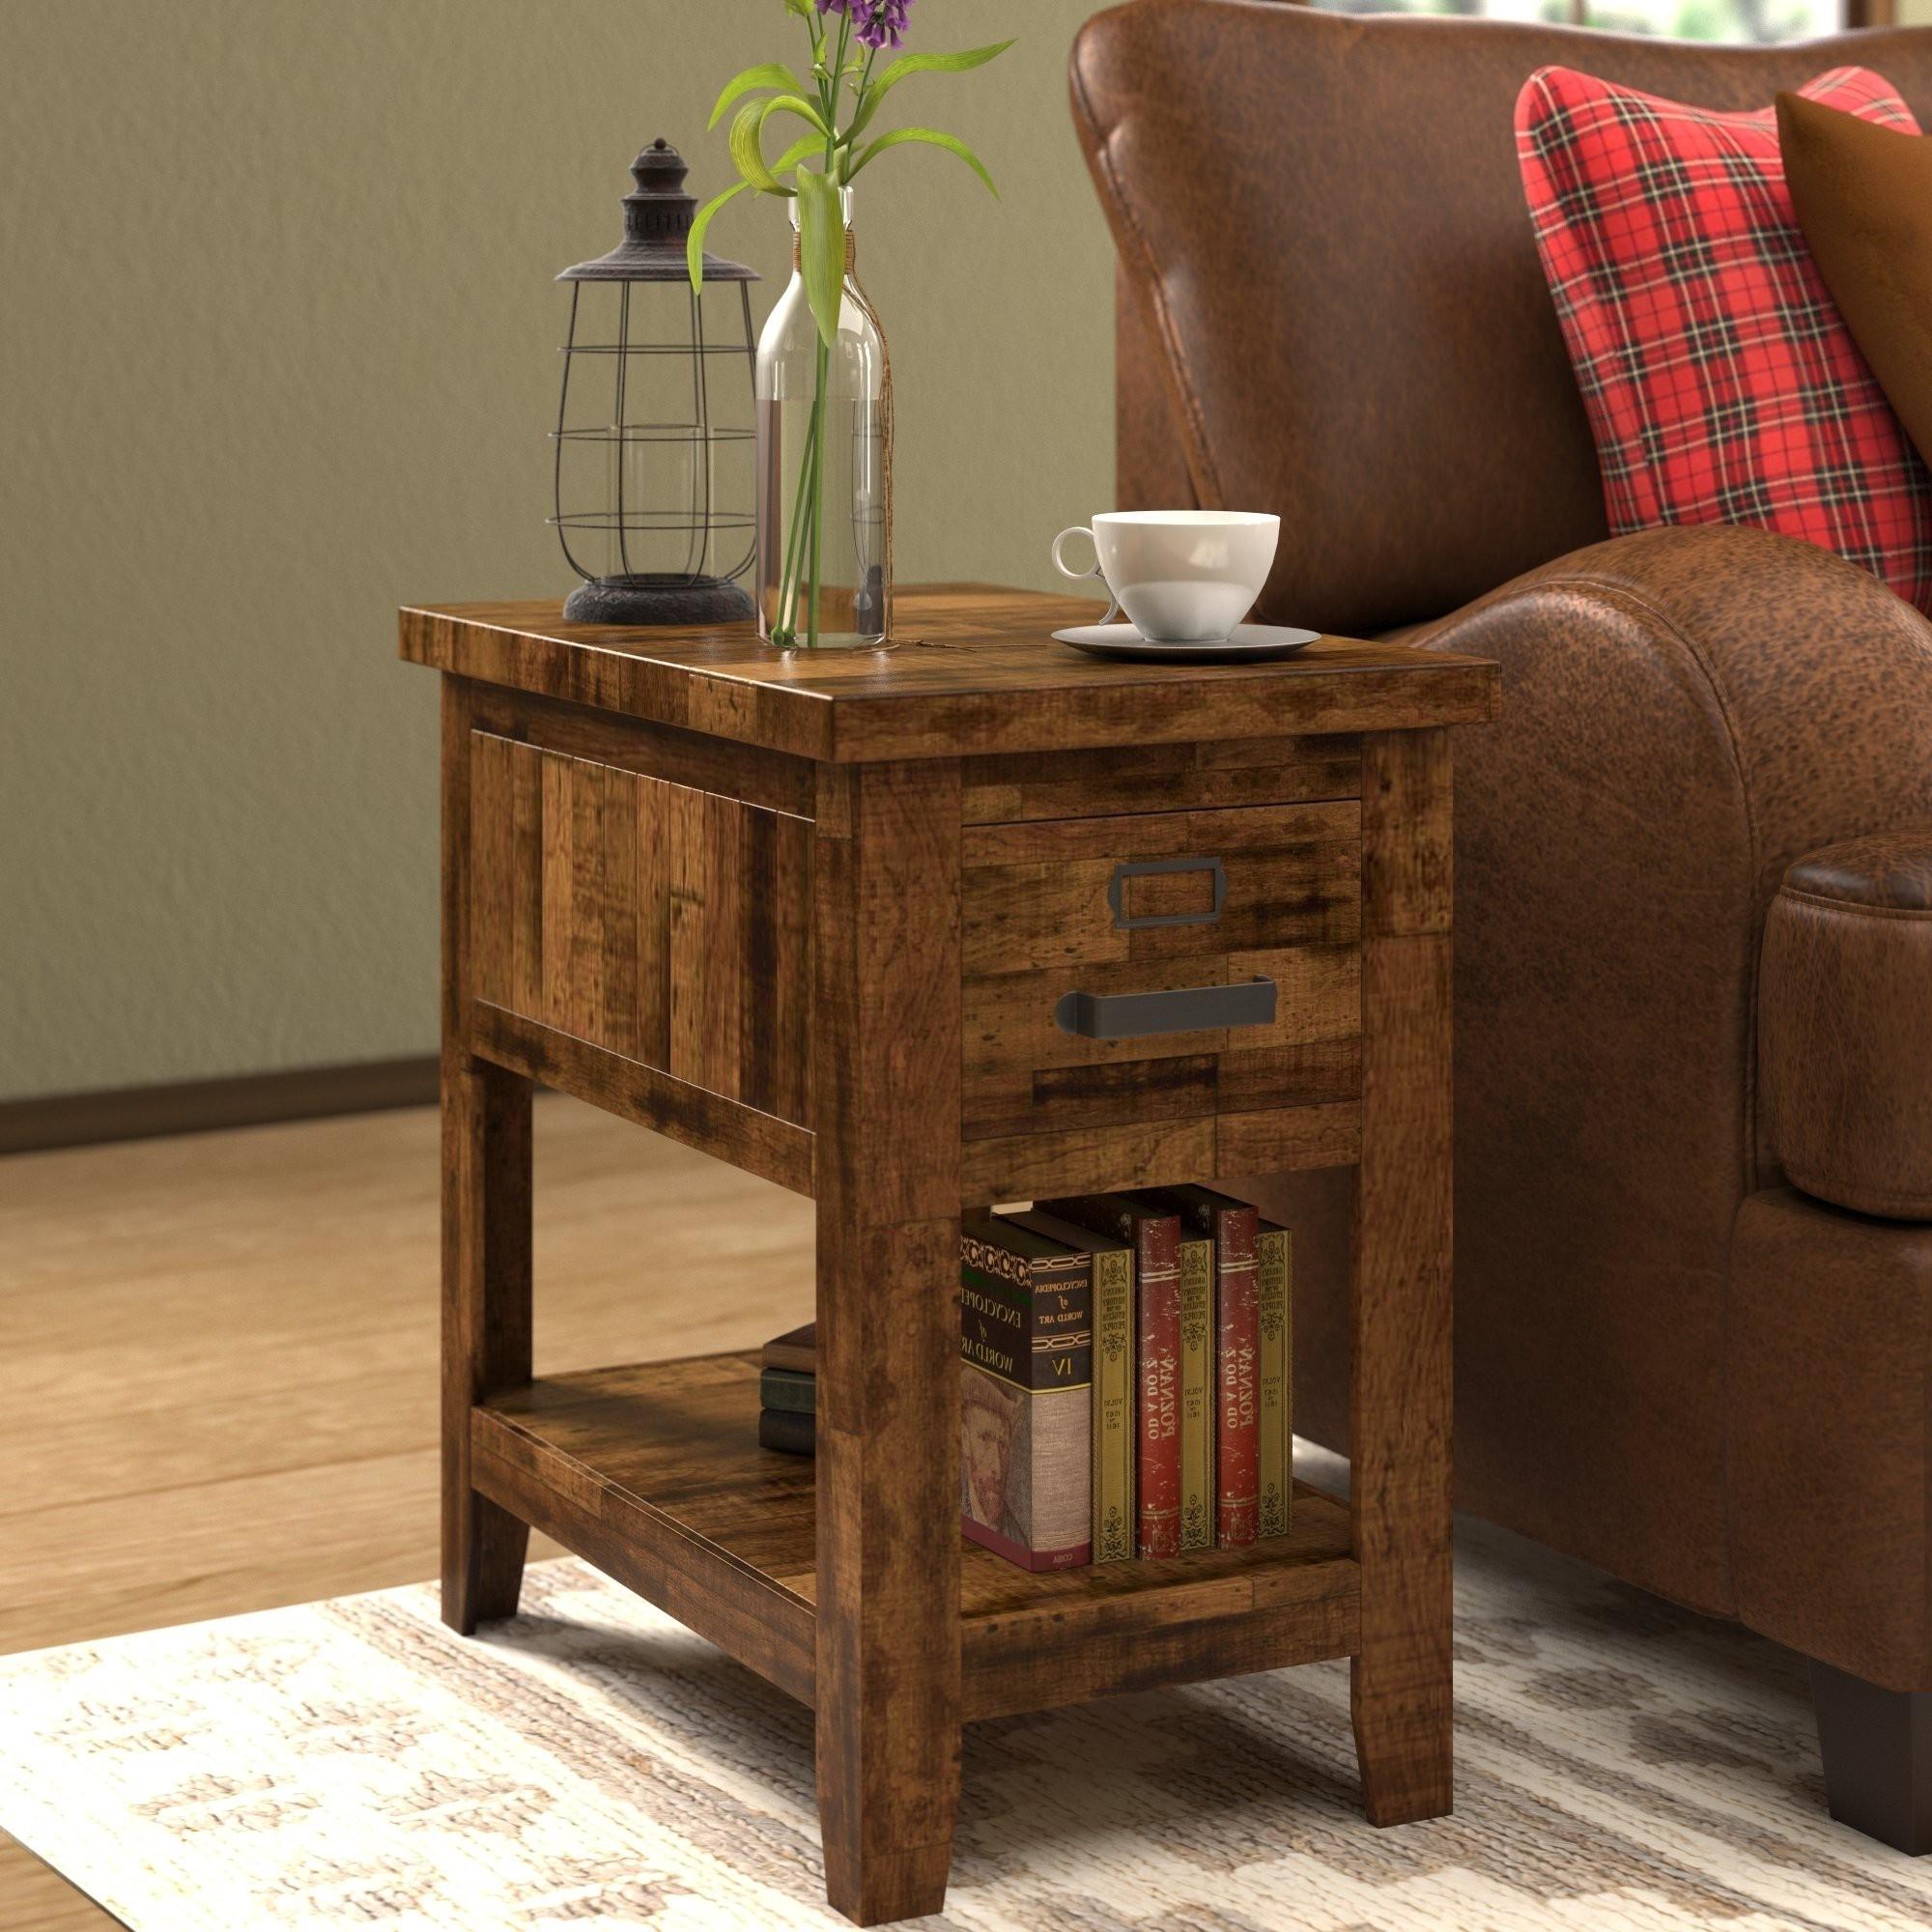 Davidrodca For Preferred Oslo Burl Wood Veneer Coffee Tables (View 11 of 20)